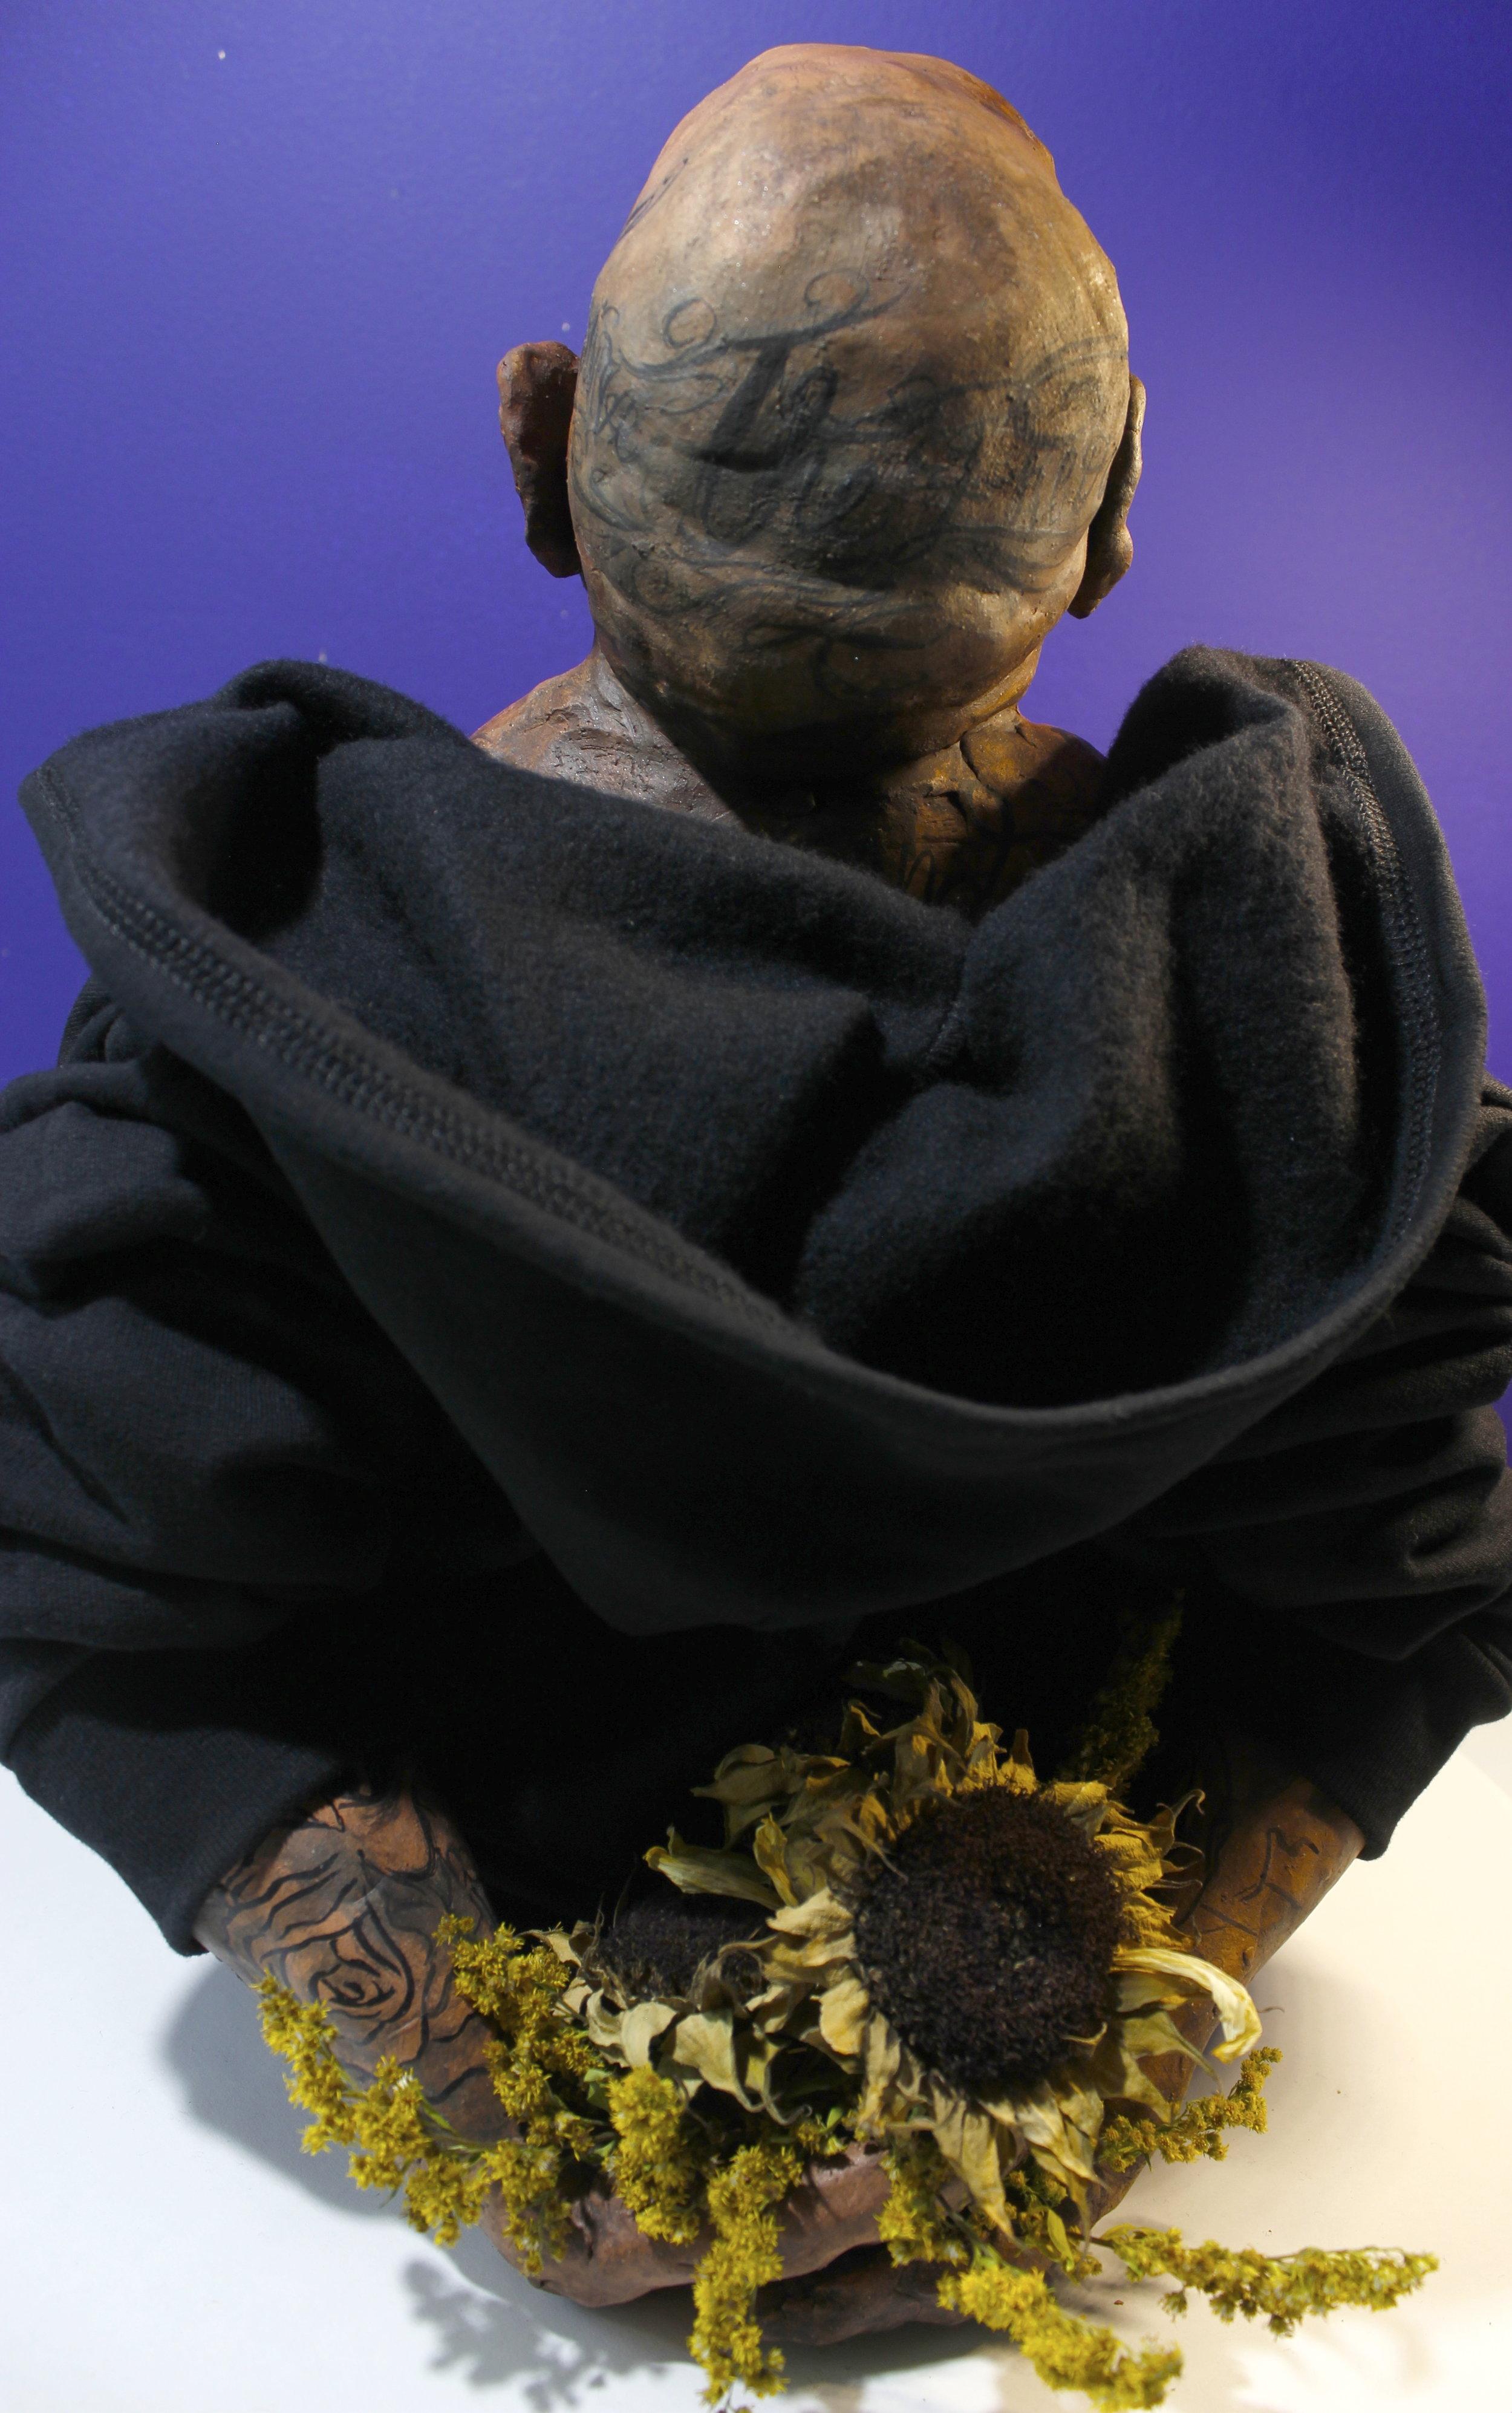 dare coulter sculpture black sculpture artist